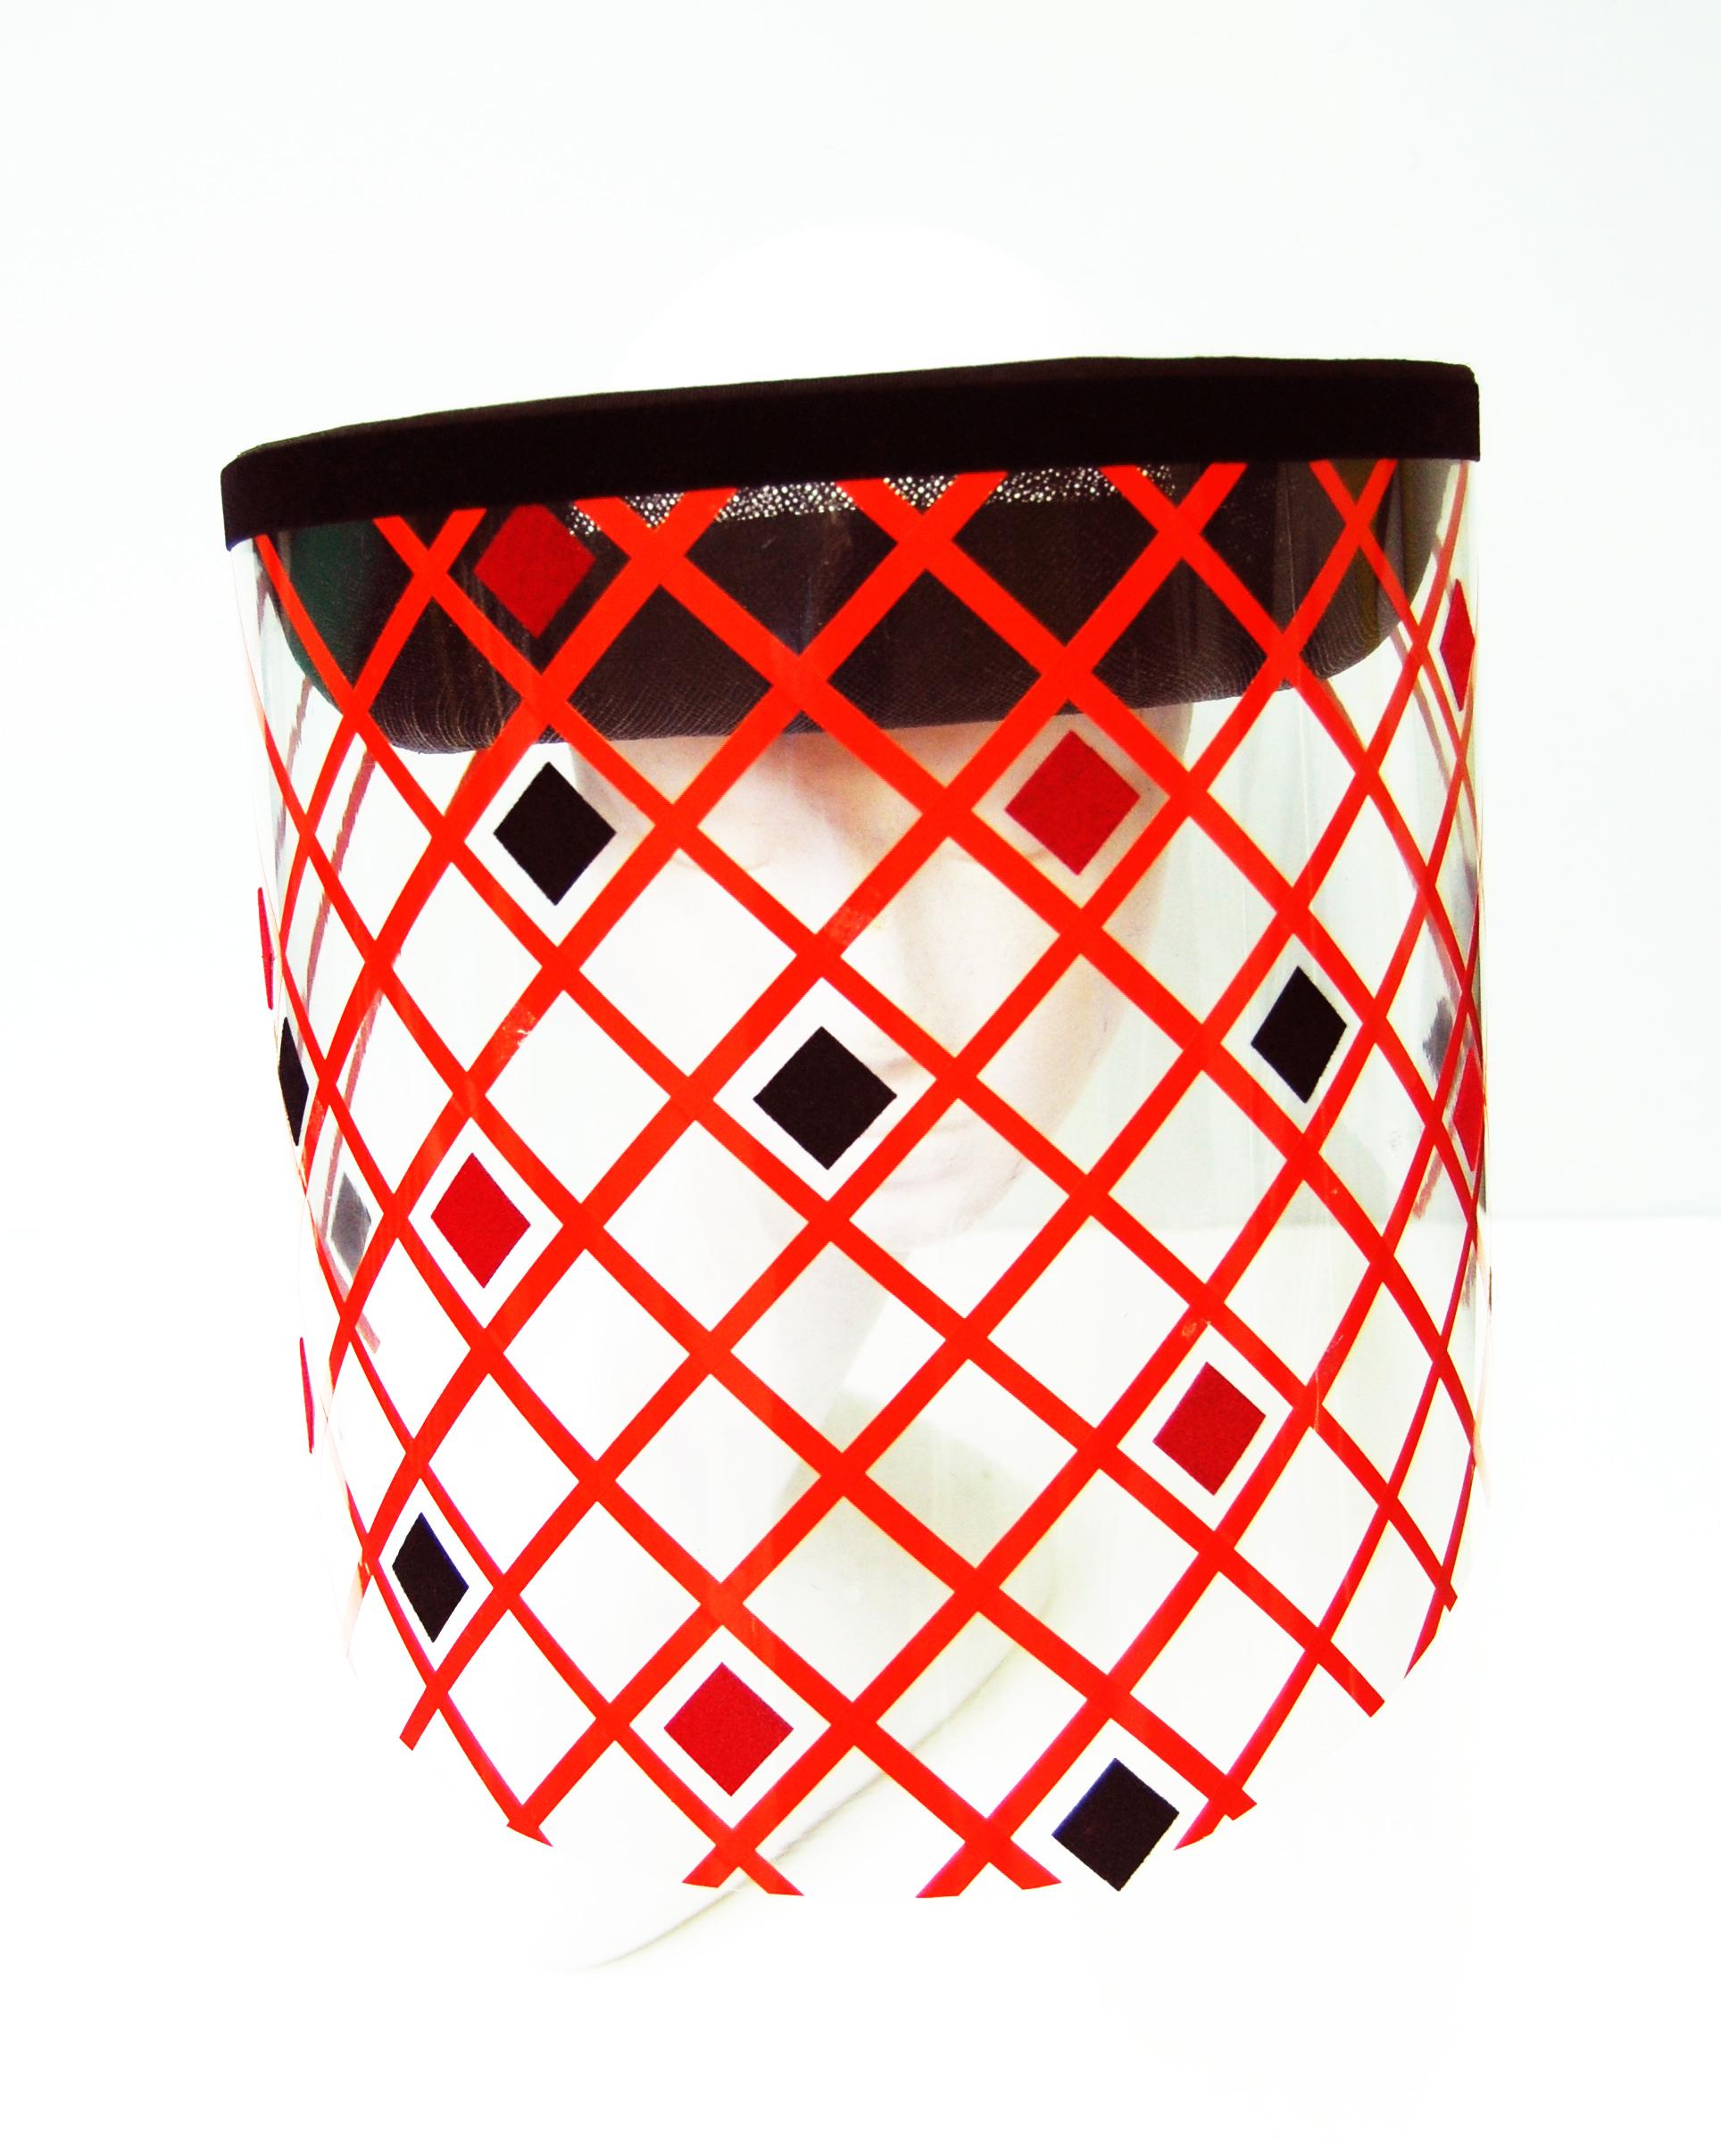 Beehive Netting front.jpg